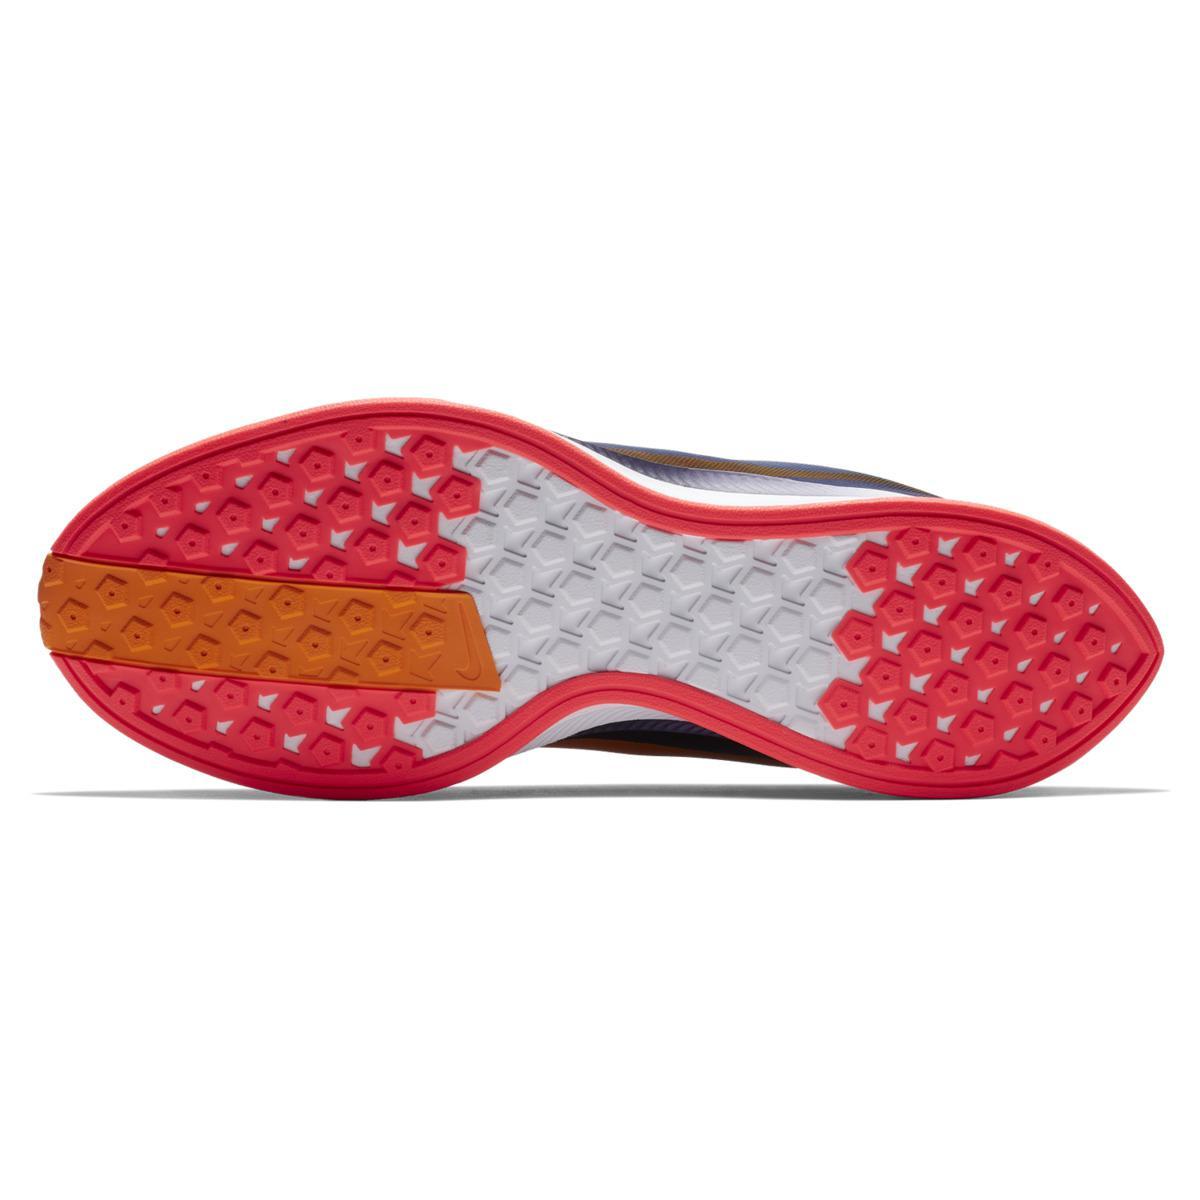 4756e33e5ecd Nike - Red Zoom Pegasus 35 Turbo Running Shoes for Men - Lyst. View  fullscreen